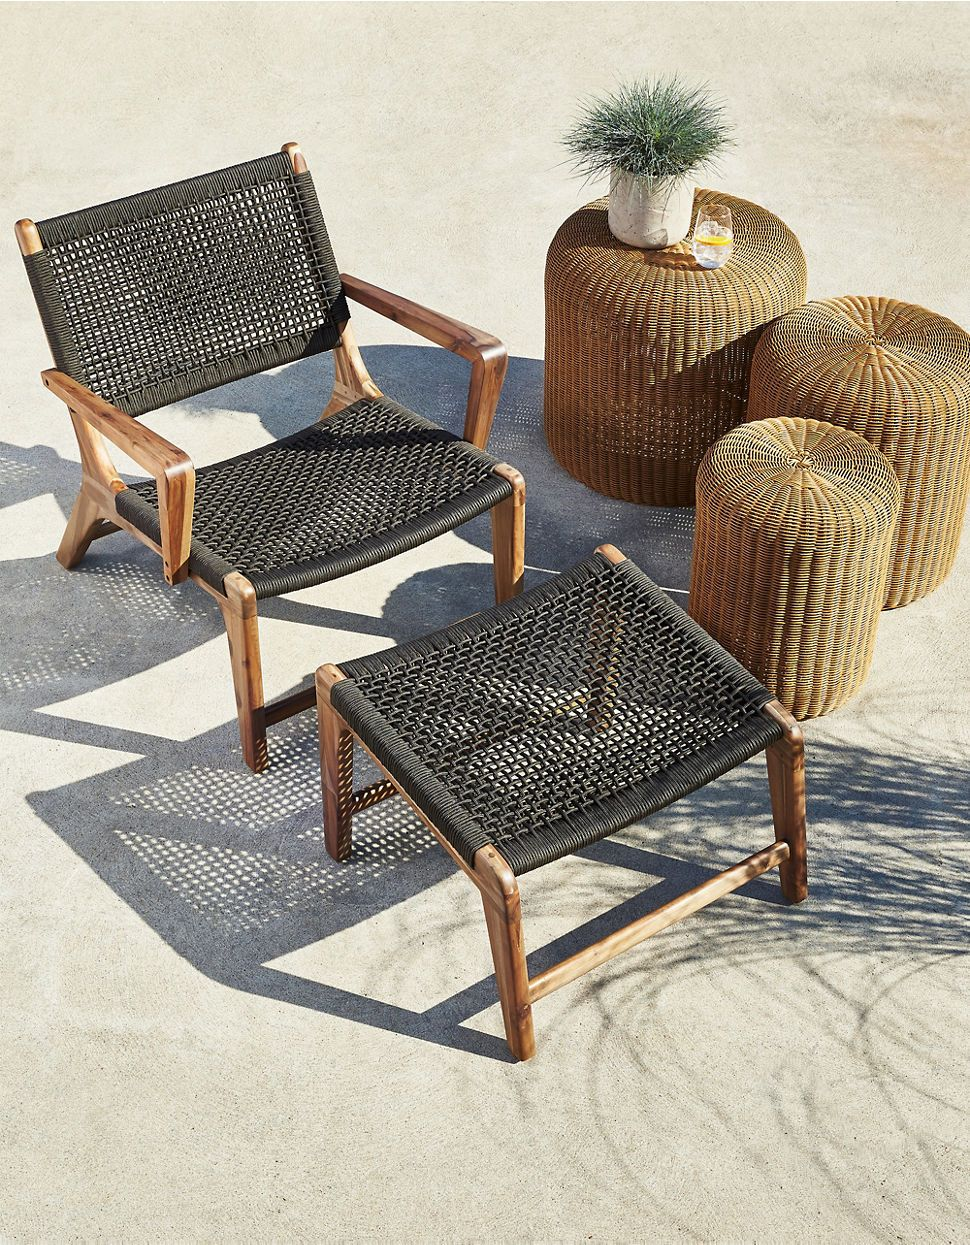 Kamala lounge chair with ottoman hudsons bay outdoor